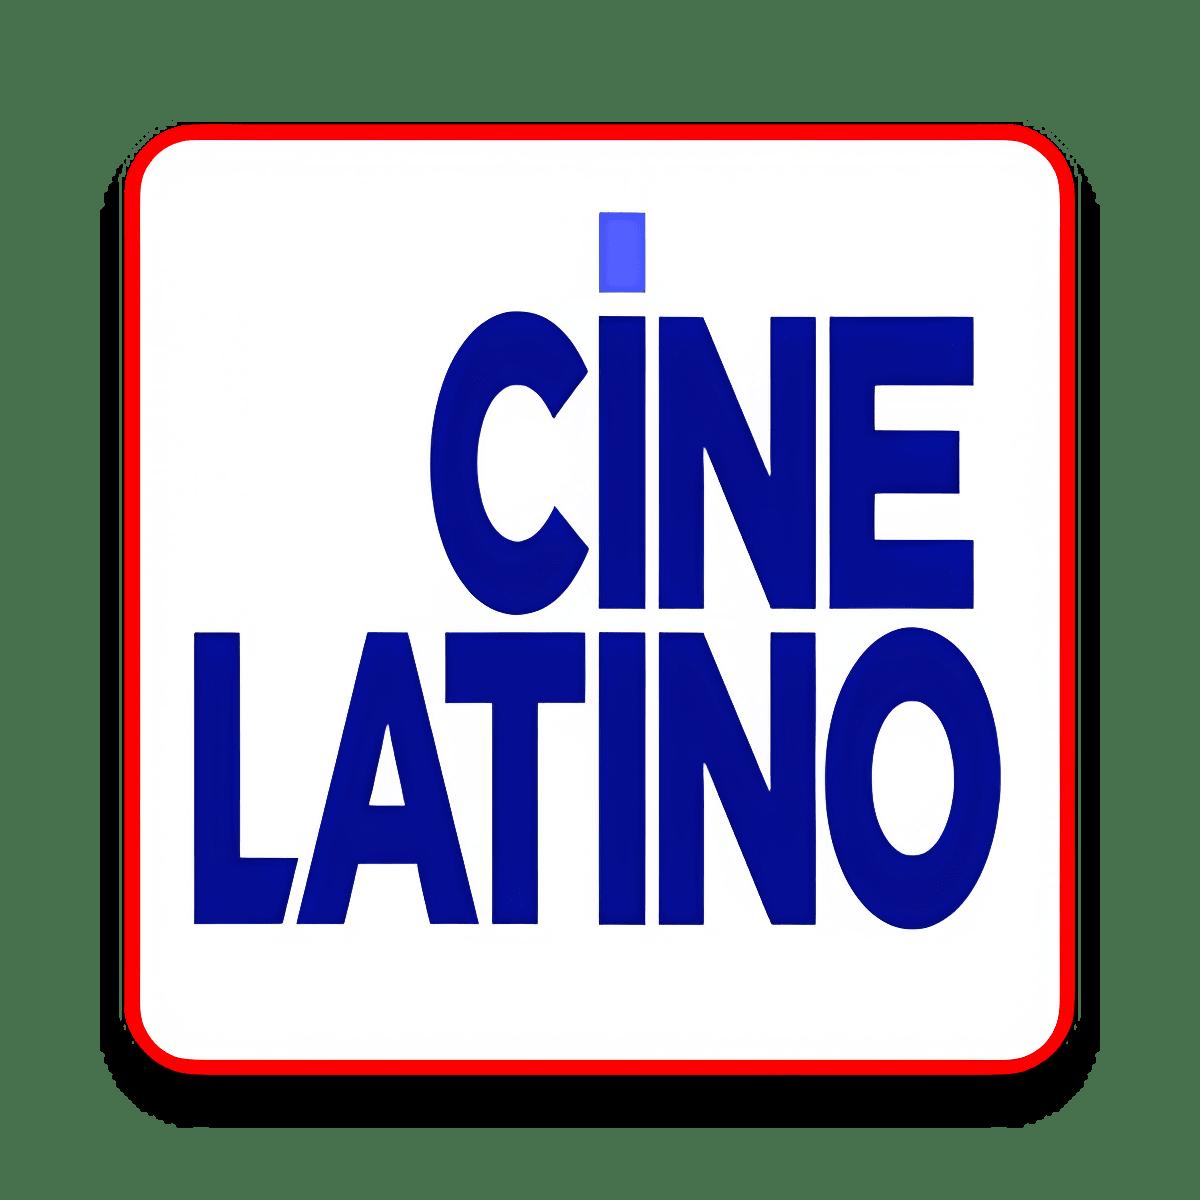 Cine latino HD 3.0